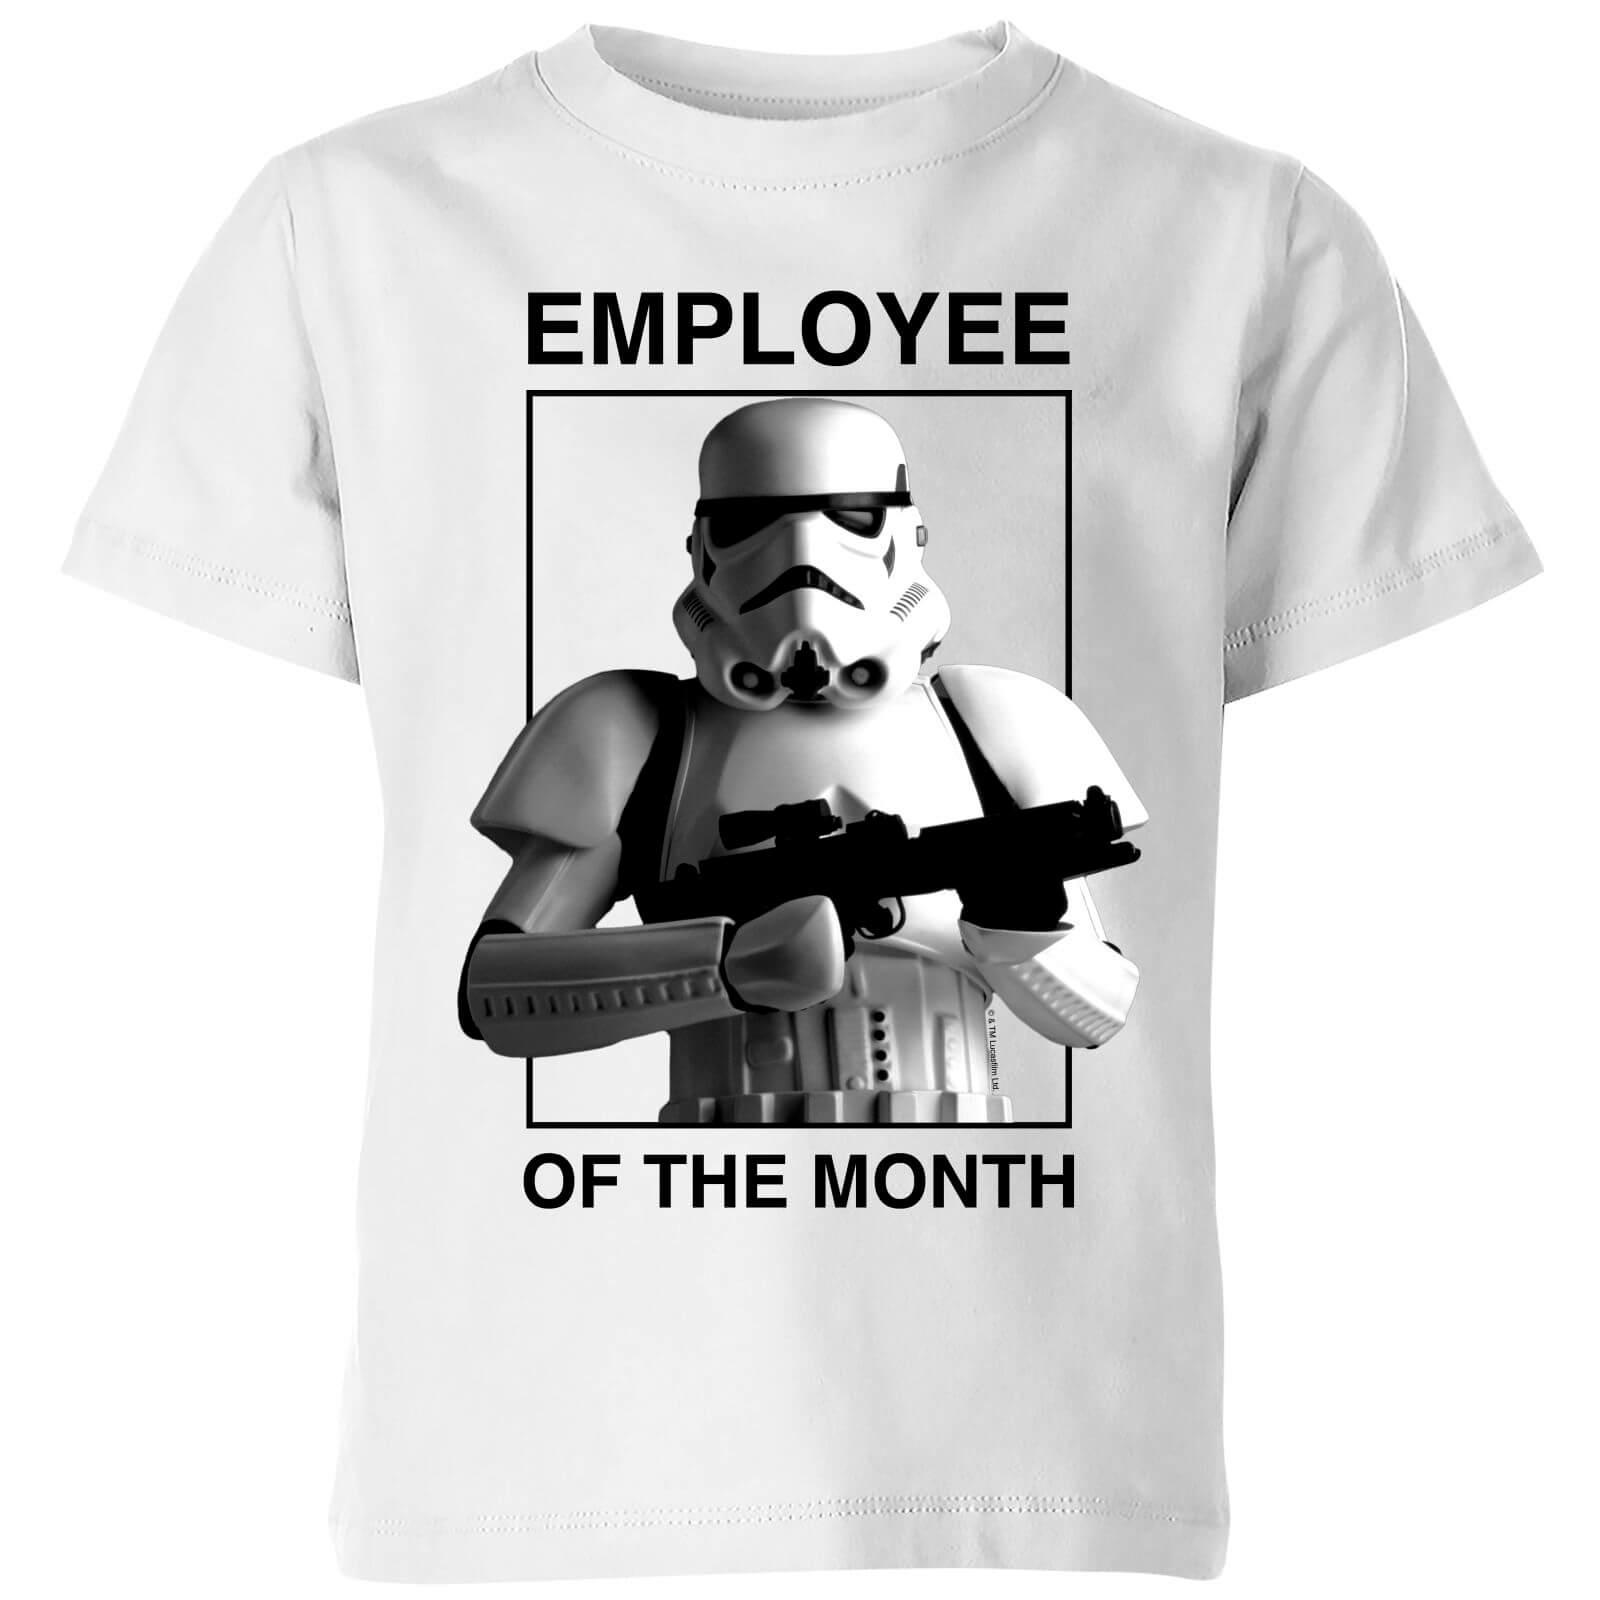 Star Wars T-Shirt Enfant Employé du Mois Star Wars Classic - Blanc - 9-10 ans - Blanc